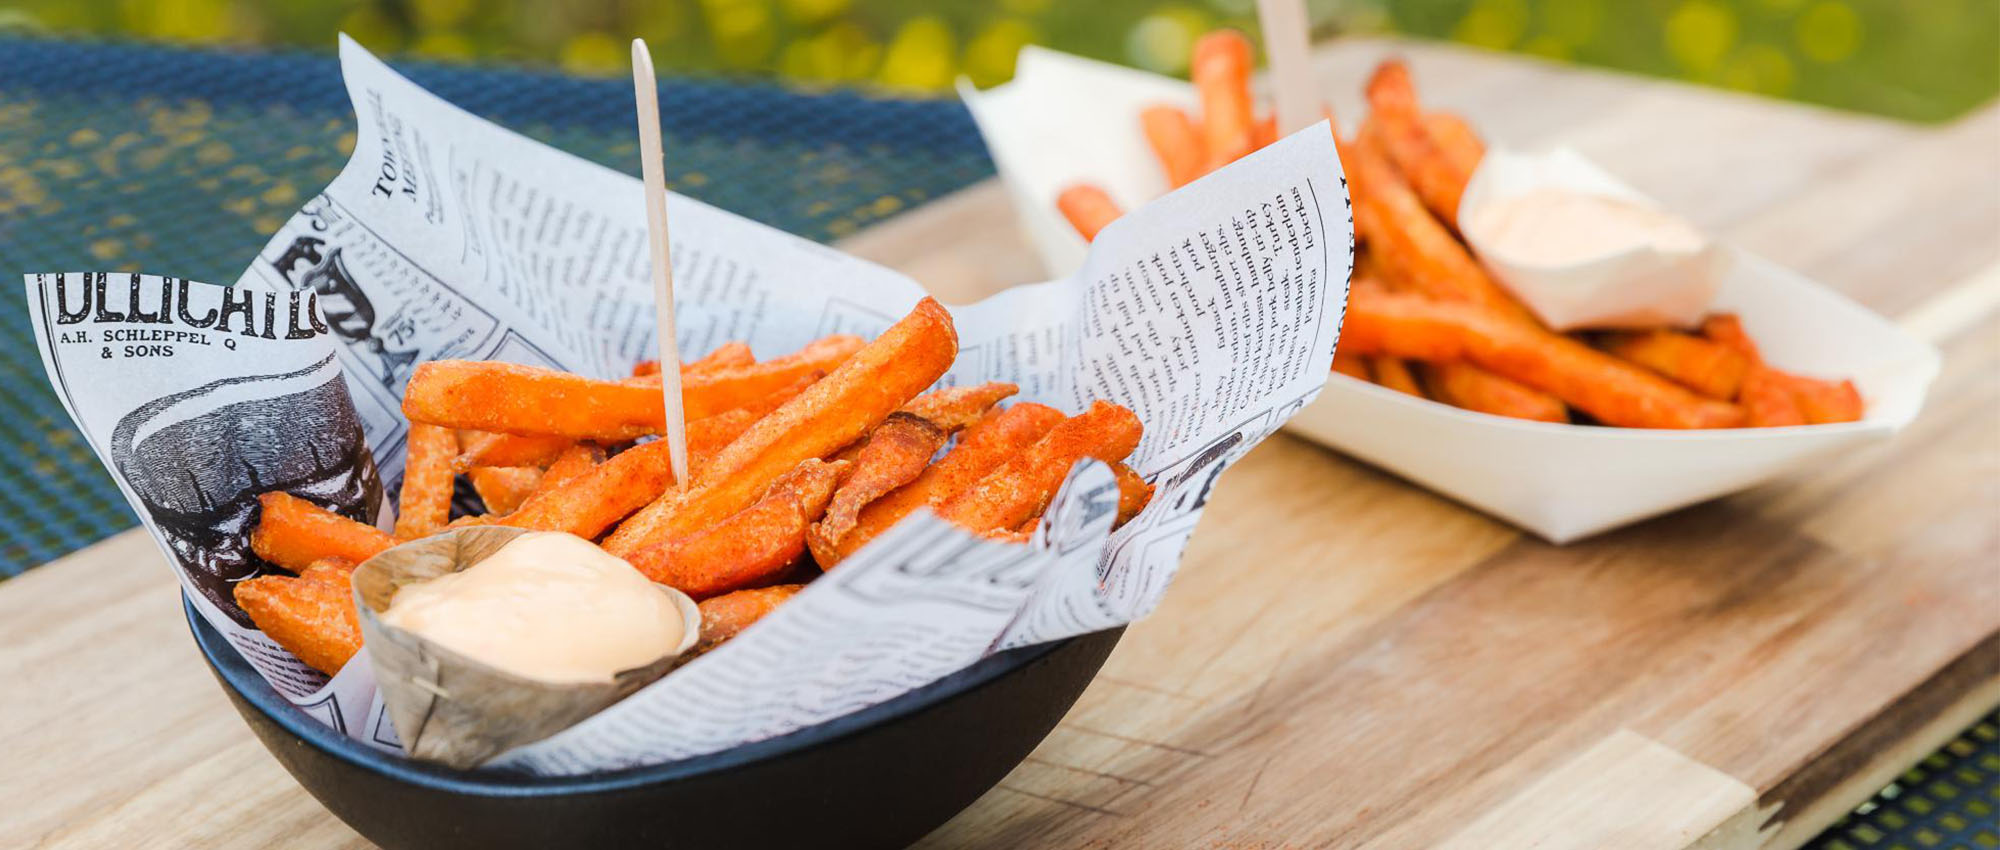 foodbar friesland